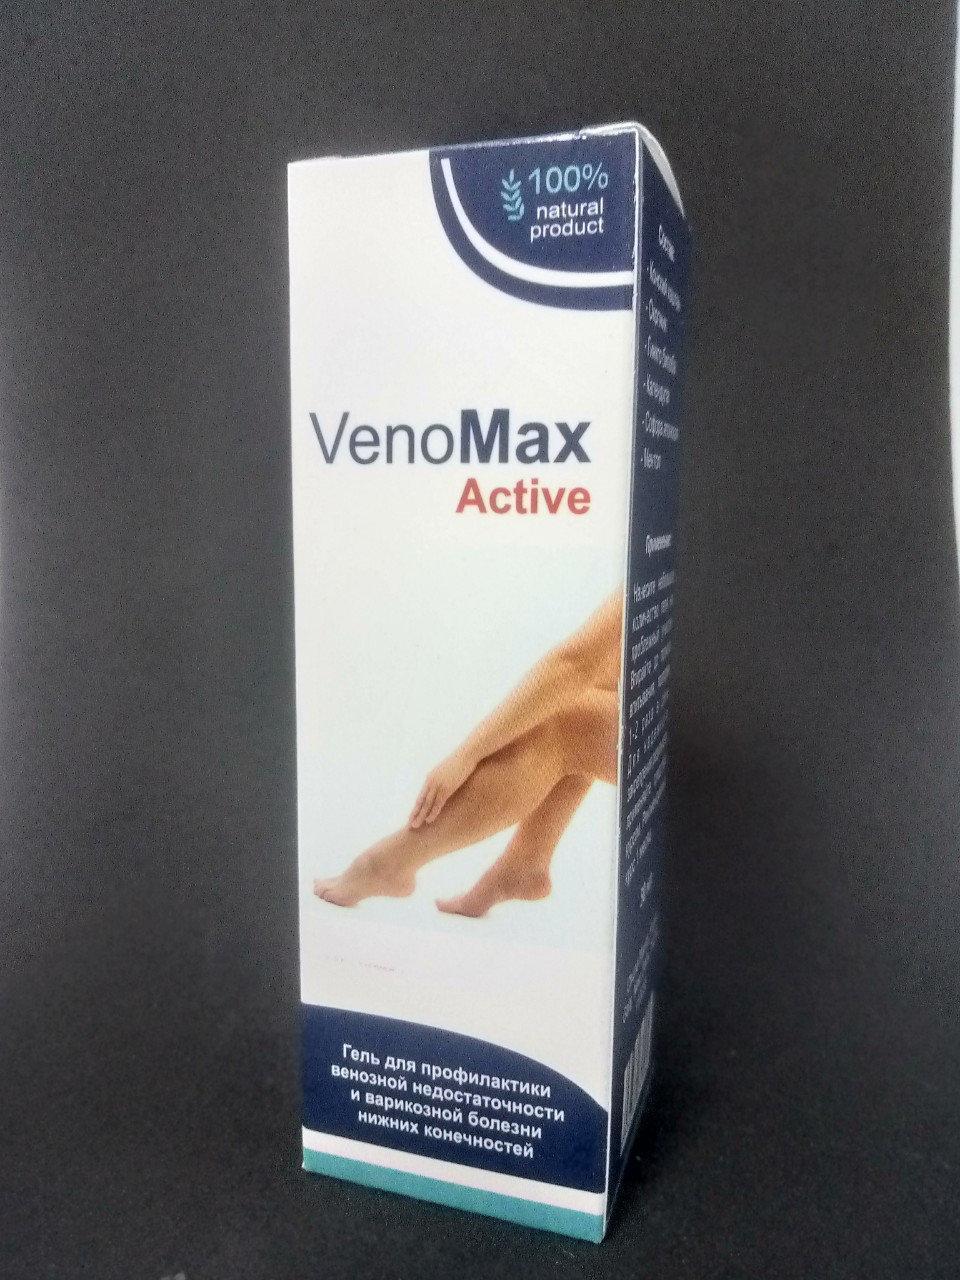 VenoMax Active – Гель от варикоза (ВеноМакс Актив) ViPpils